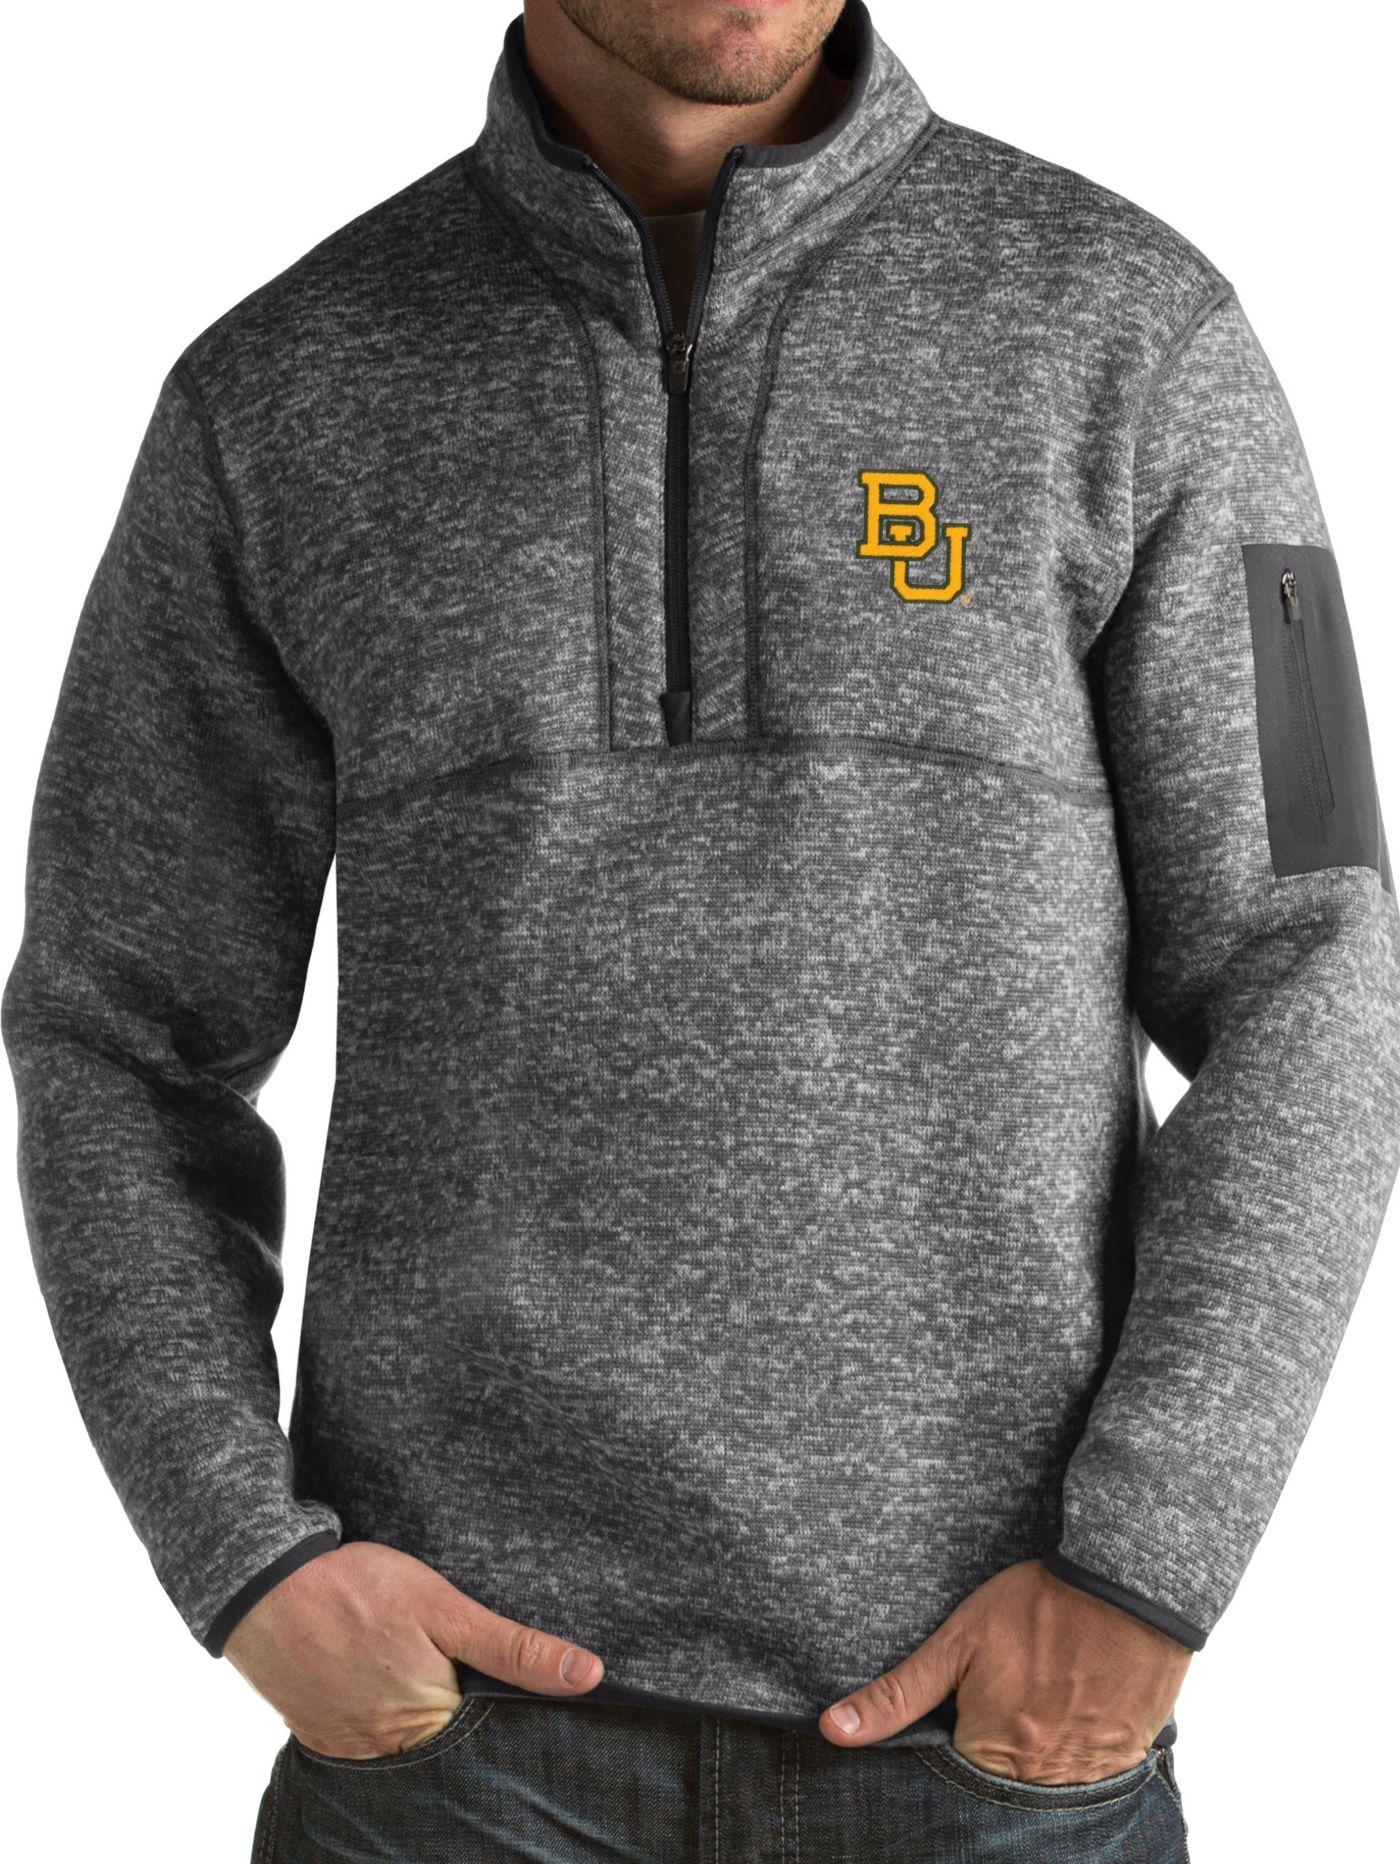 Antigua Men's Baylor Bears Grey Fortune Pullover Jacket